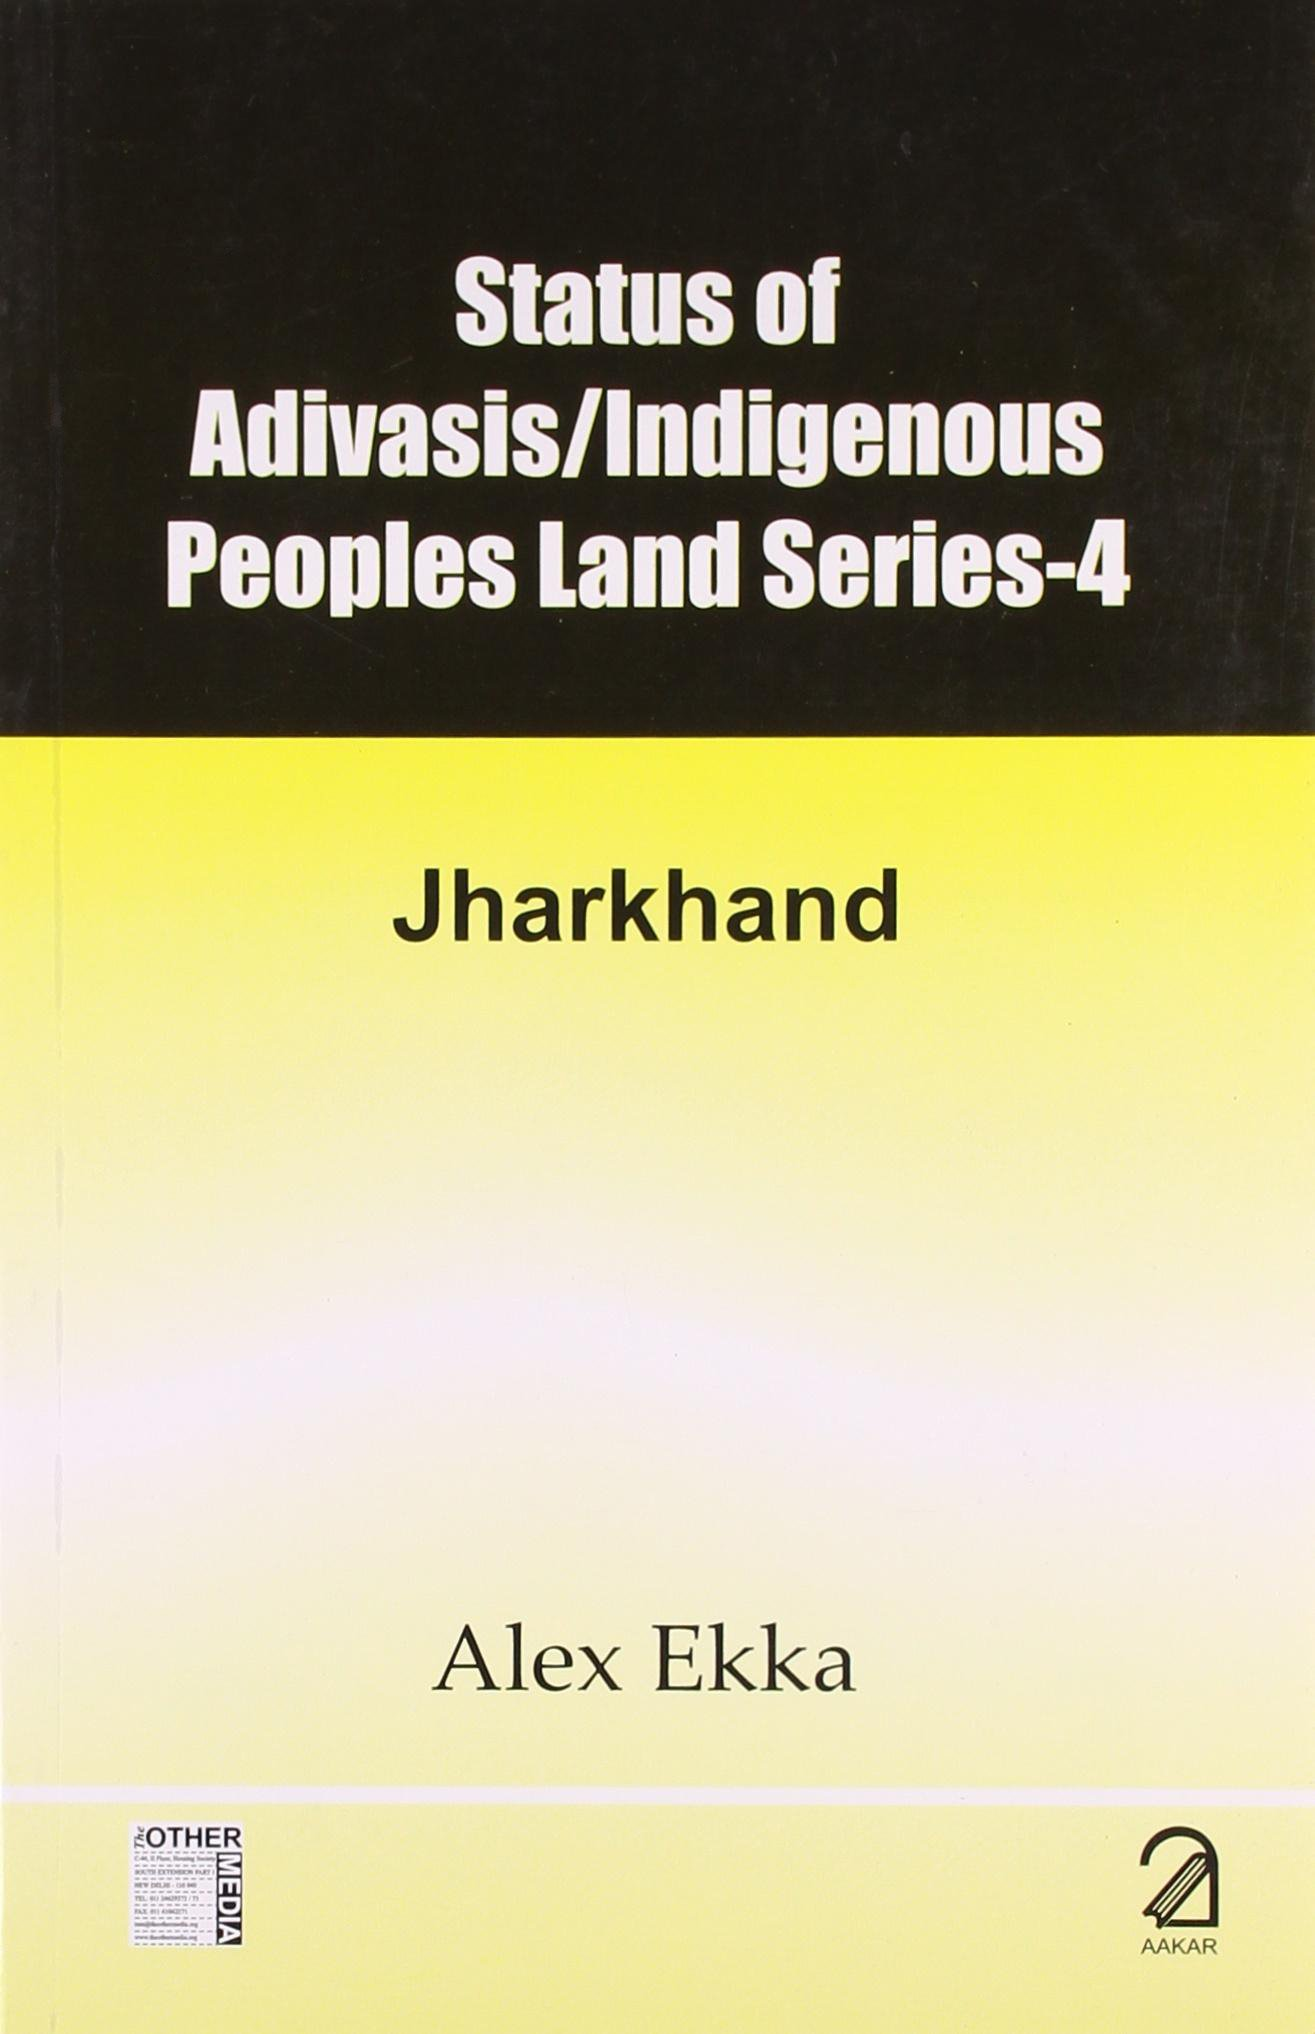 Download Status of Adivasis Indigenous Peoples Land Series 4: Jharkhand PDF ePub fb2 book